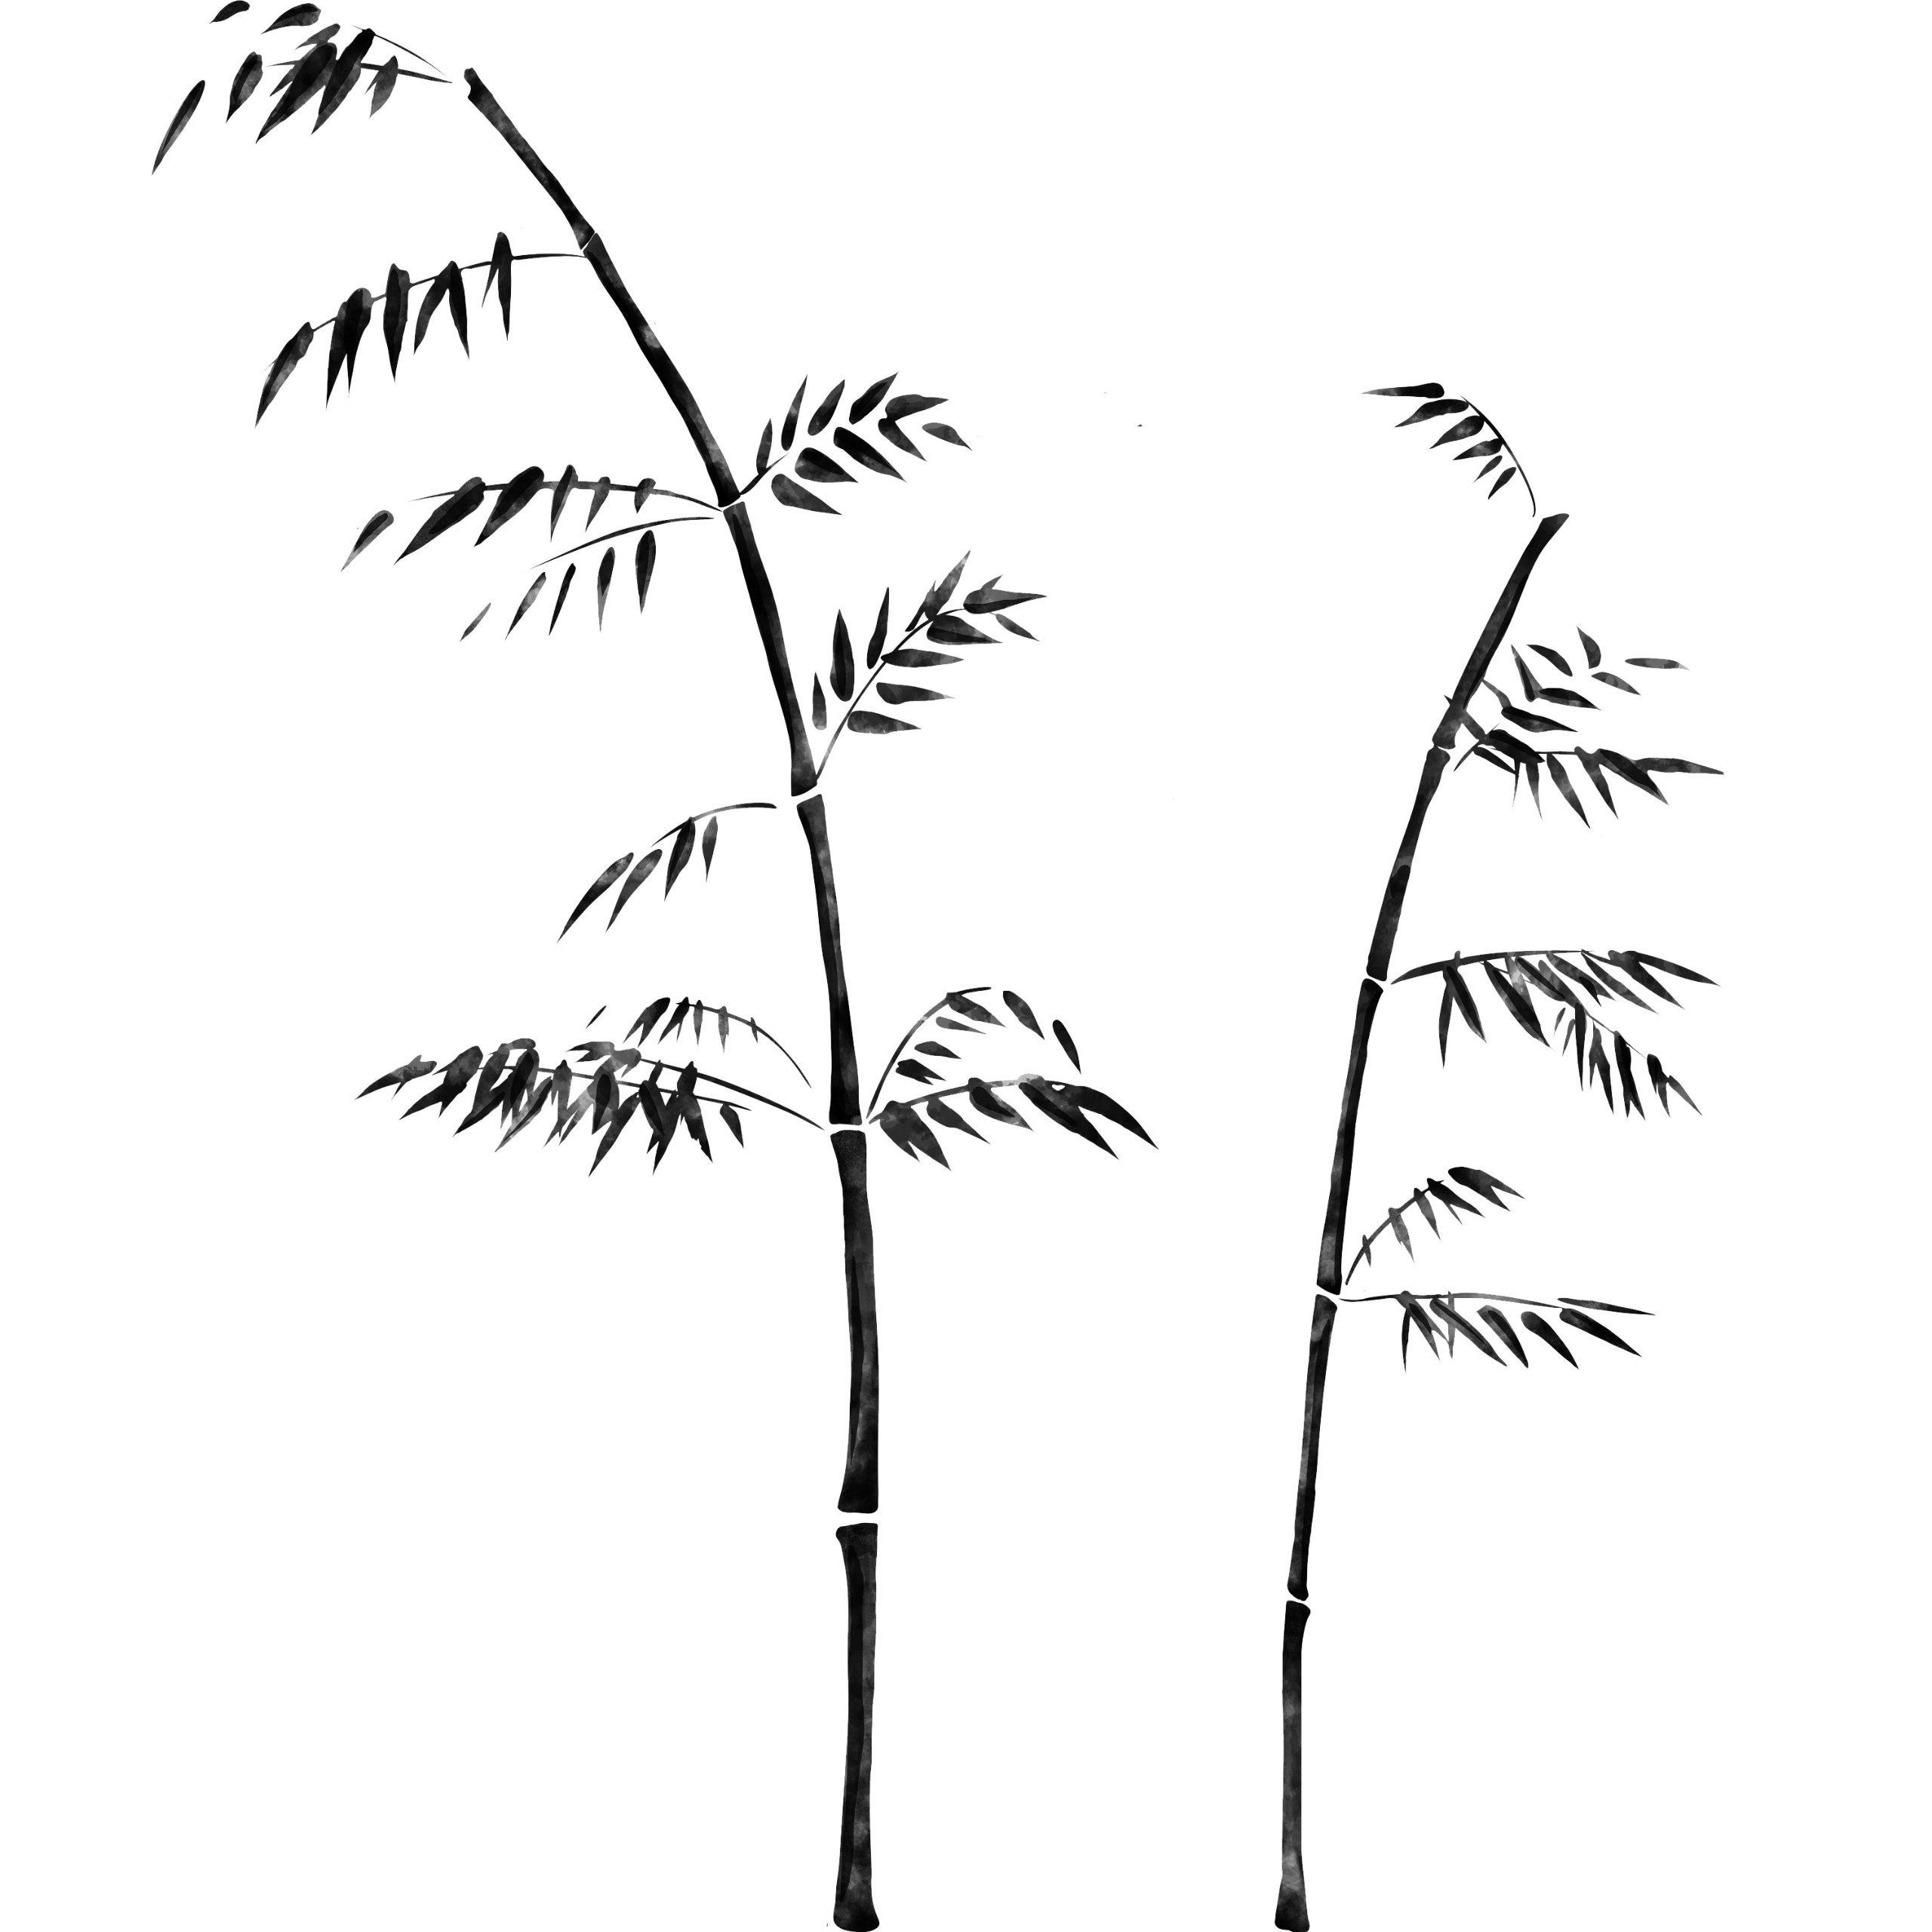 Vinilo Decorativo Pared [052FUMJC] bamboo ramas